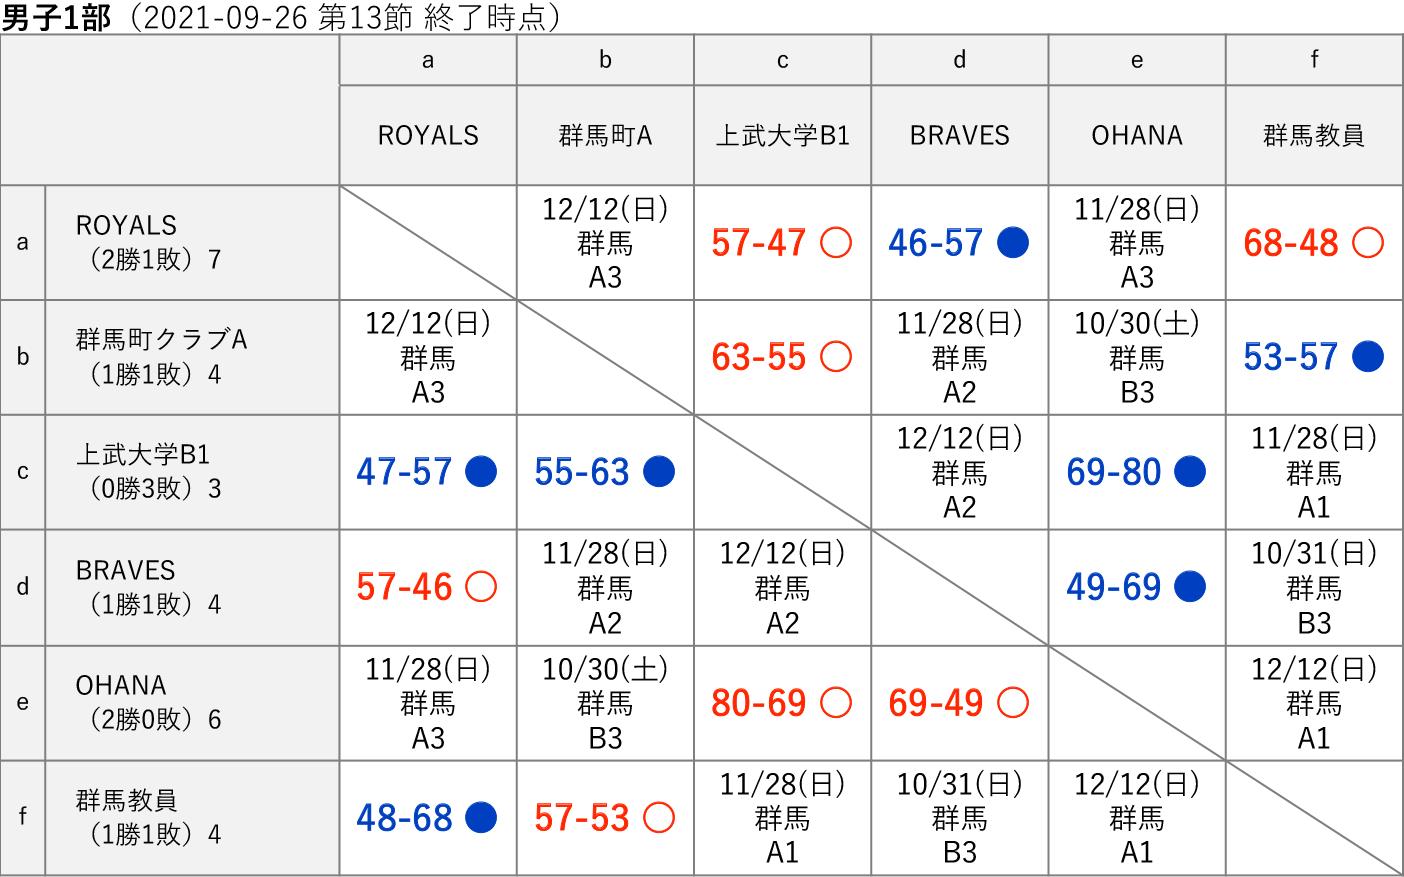 2021社会人リーグ 男子1部 星取り表(2021-09-26 第13節終了時)